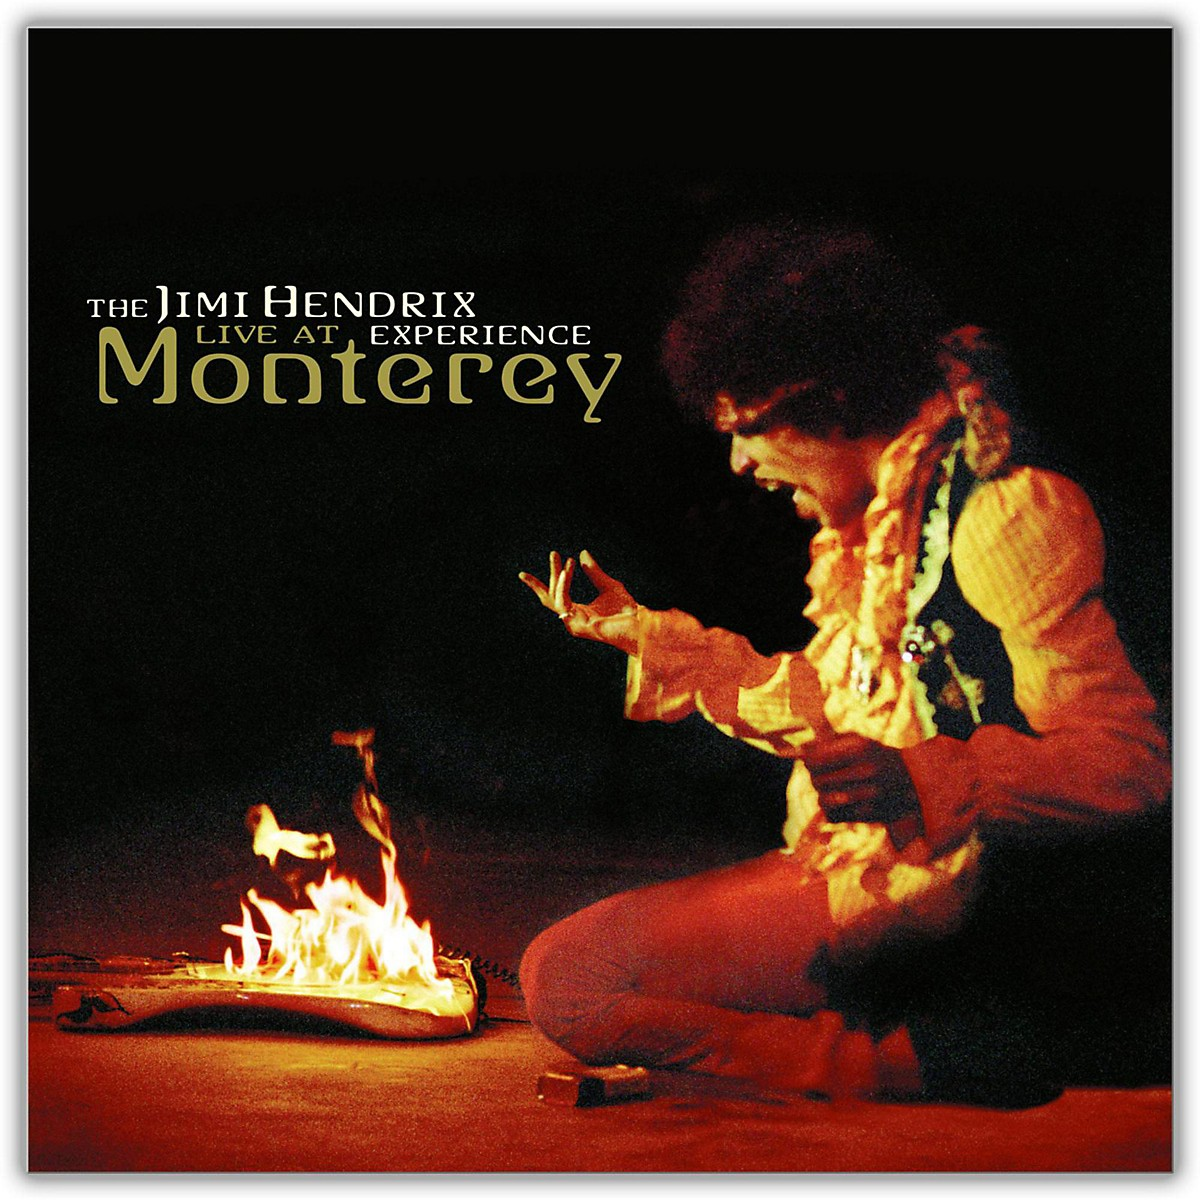 Sony Jimi Hendrix - Live at Monterey Vinyl LP